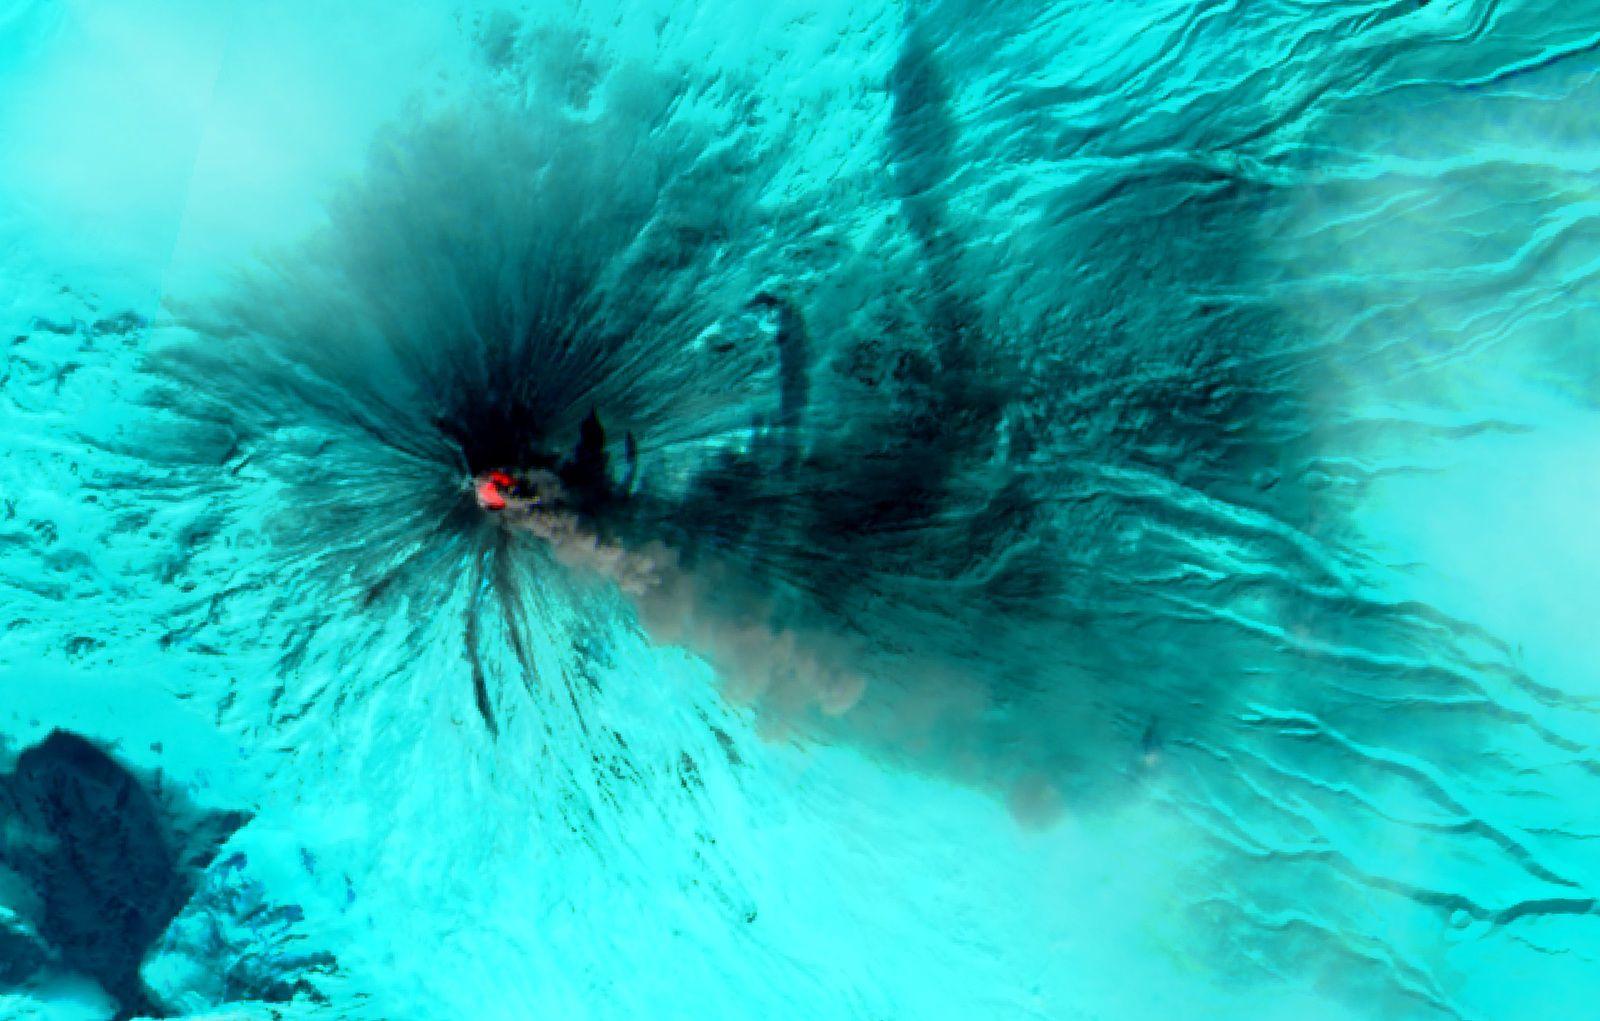 Péninsule du Kamtchatka - Volcan Klioutchevskoï - Klioutchevskaïa Sopka - Russie - Eruption Mars 2020 - Sentinel-2 - Copernicus - ESA - Commission européenne - Volcano